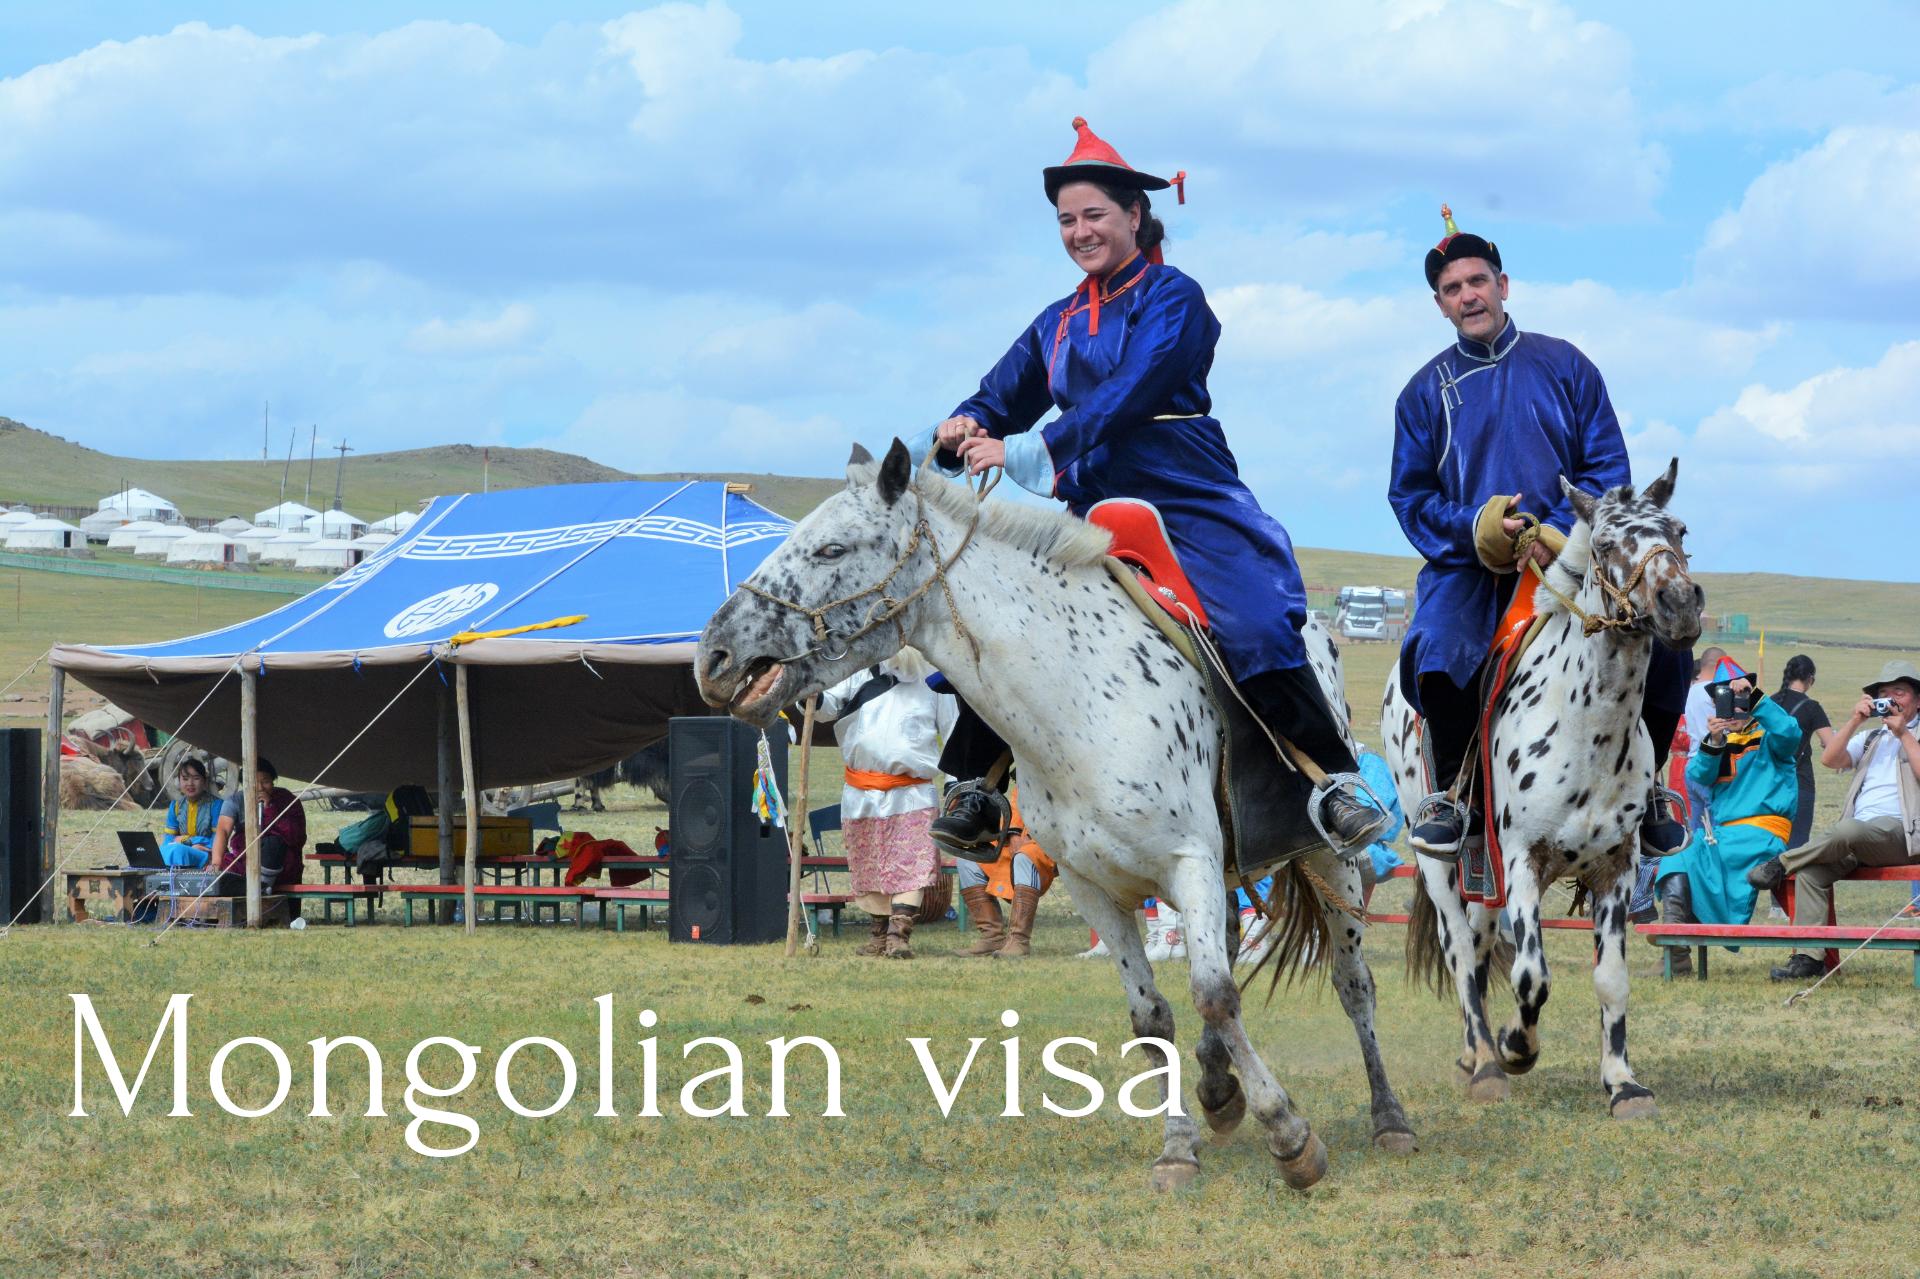 Nationals visa free to Mongolia